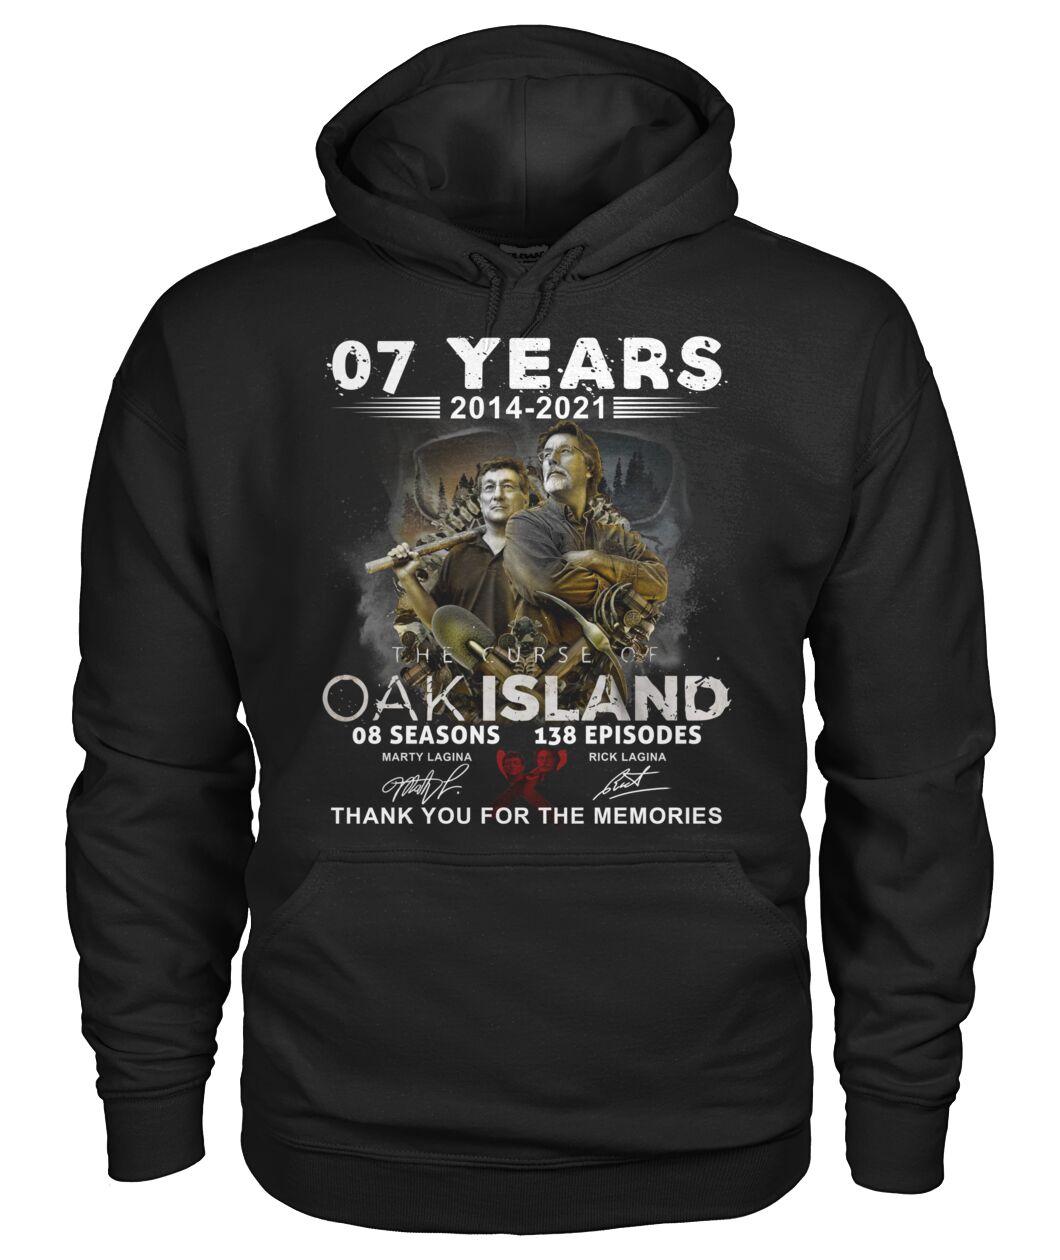 07 years 2014 2021 OAK island 08 seasons thank you for memories shirt 11